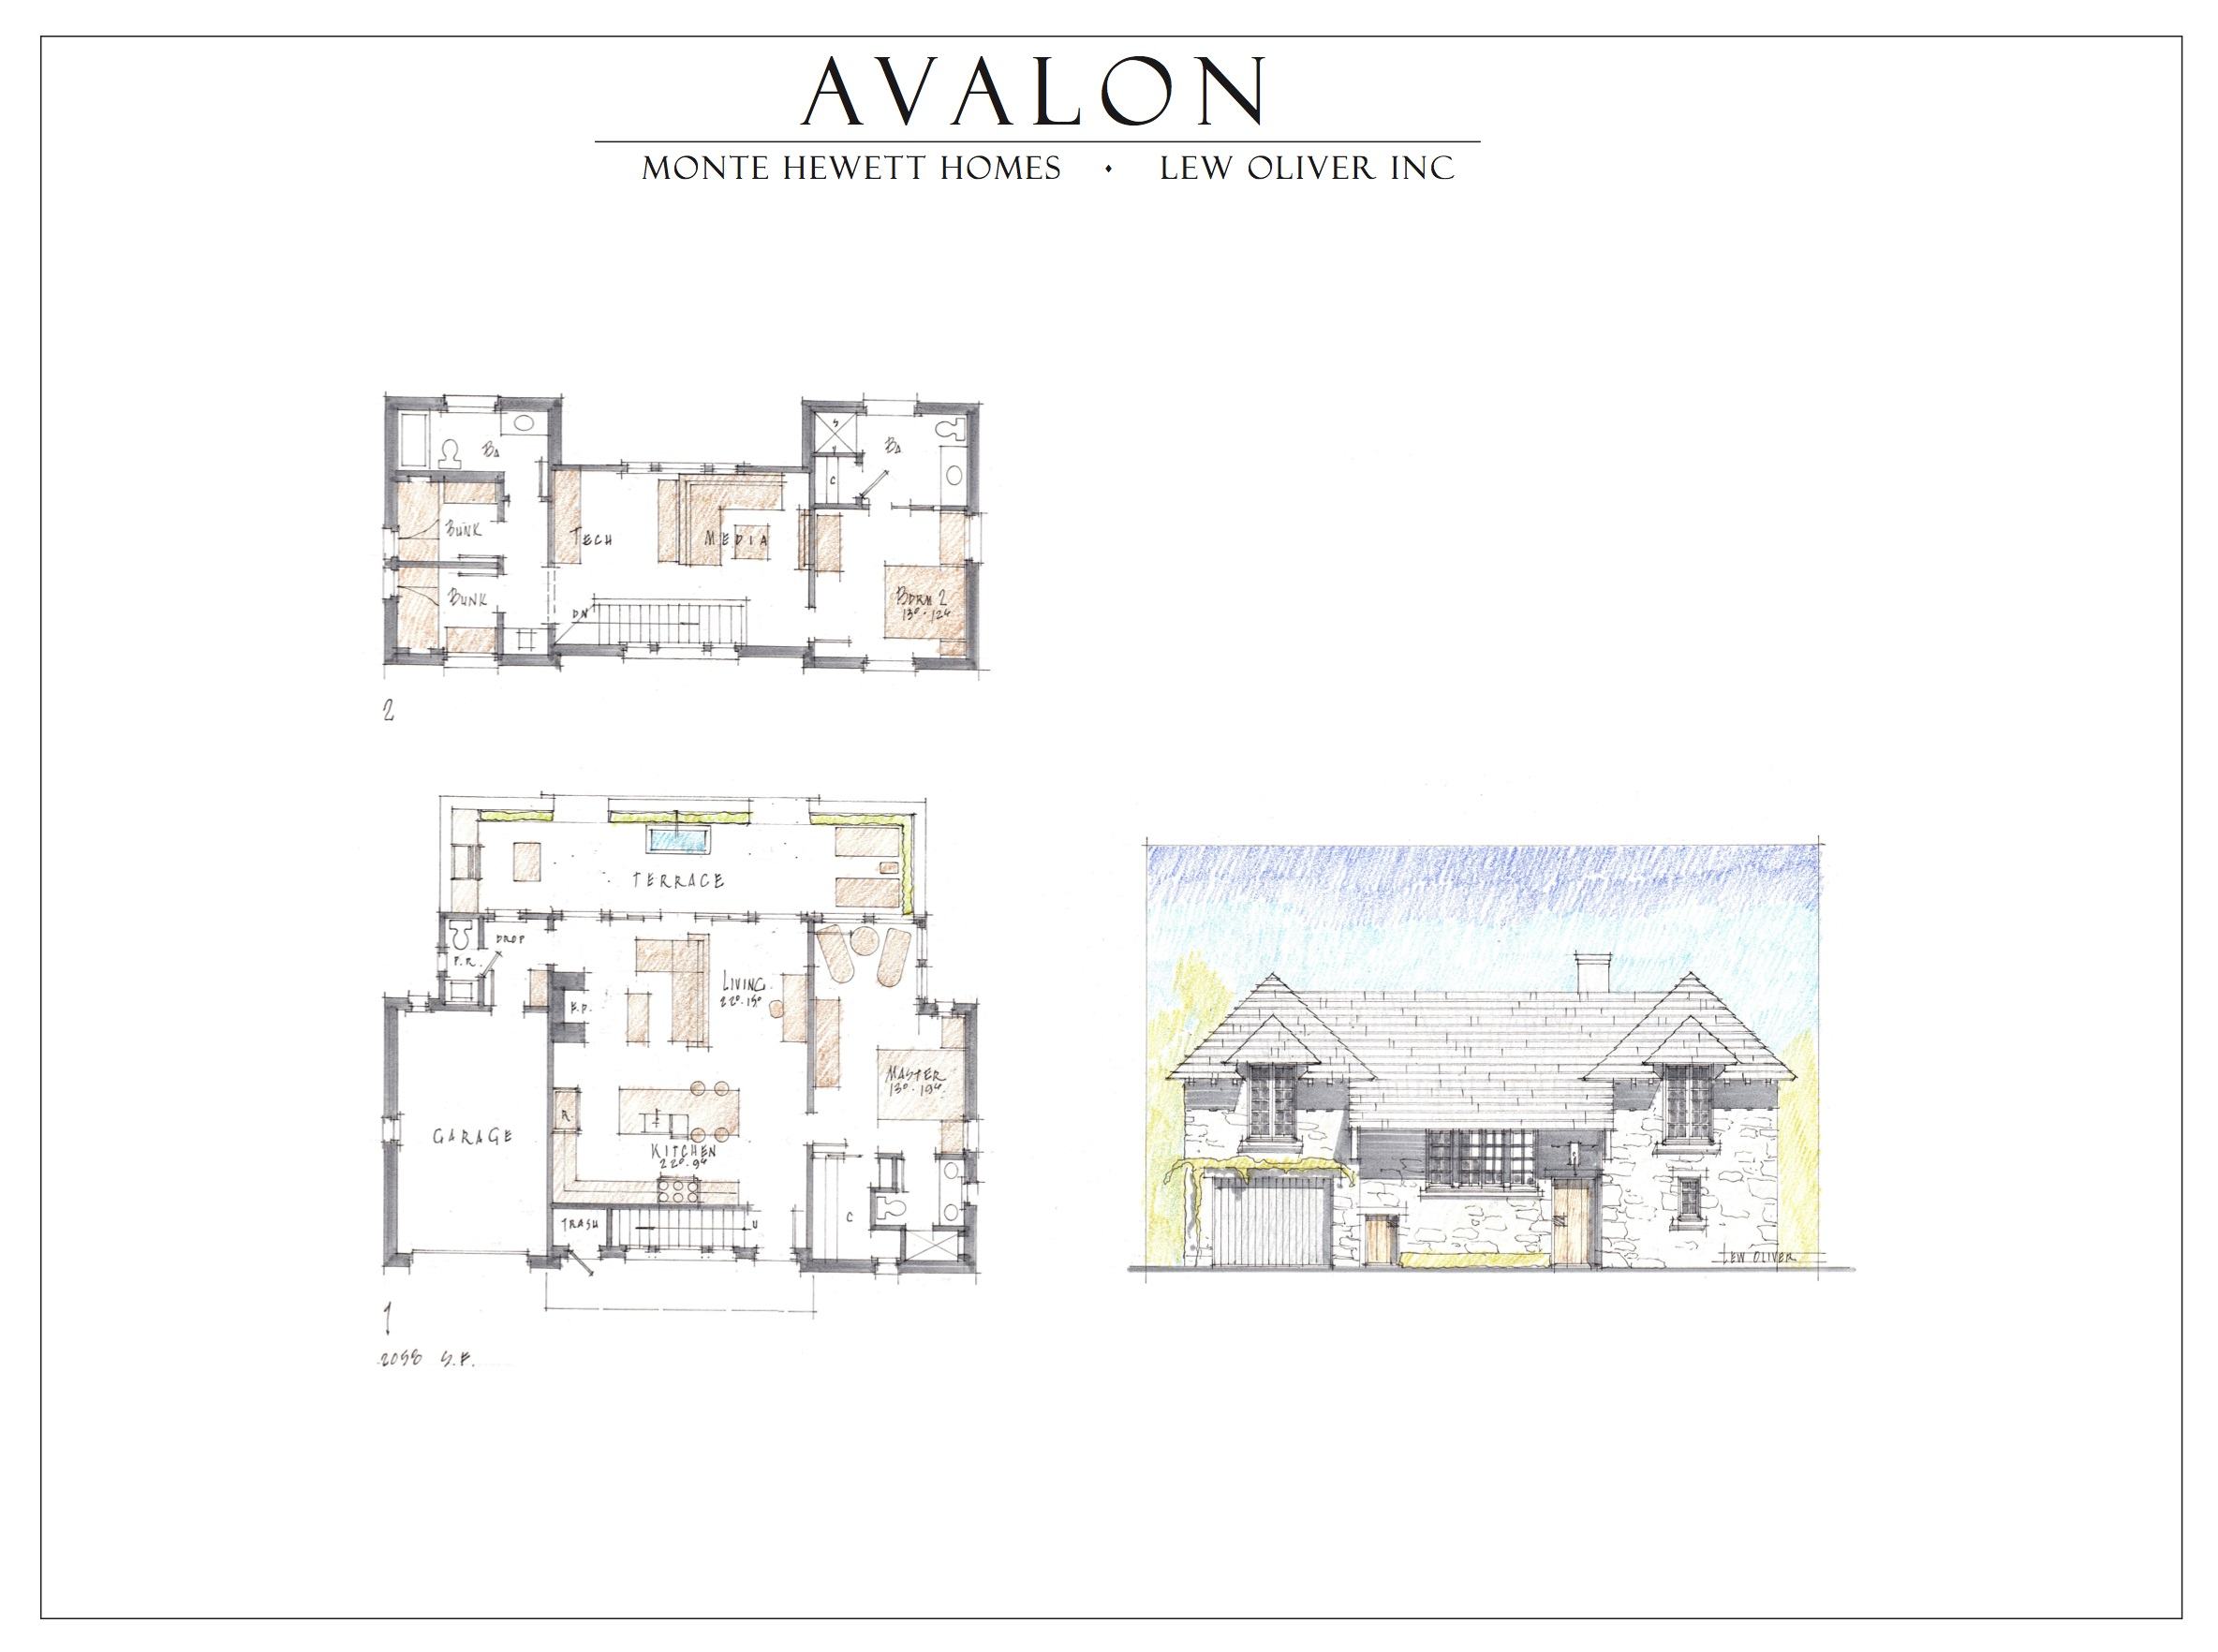 Avalon alpharetta homes home review for Avalon home builders